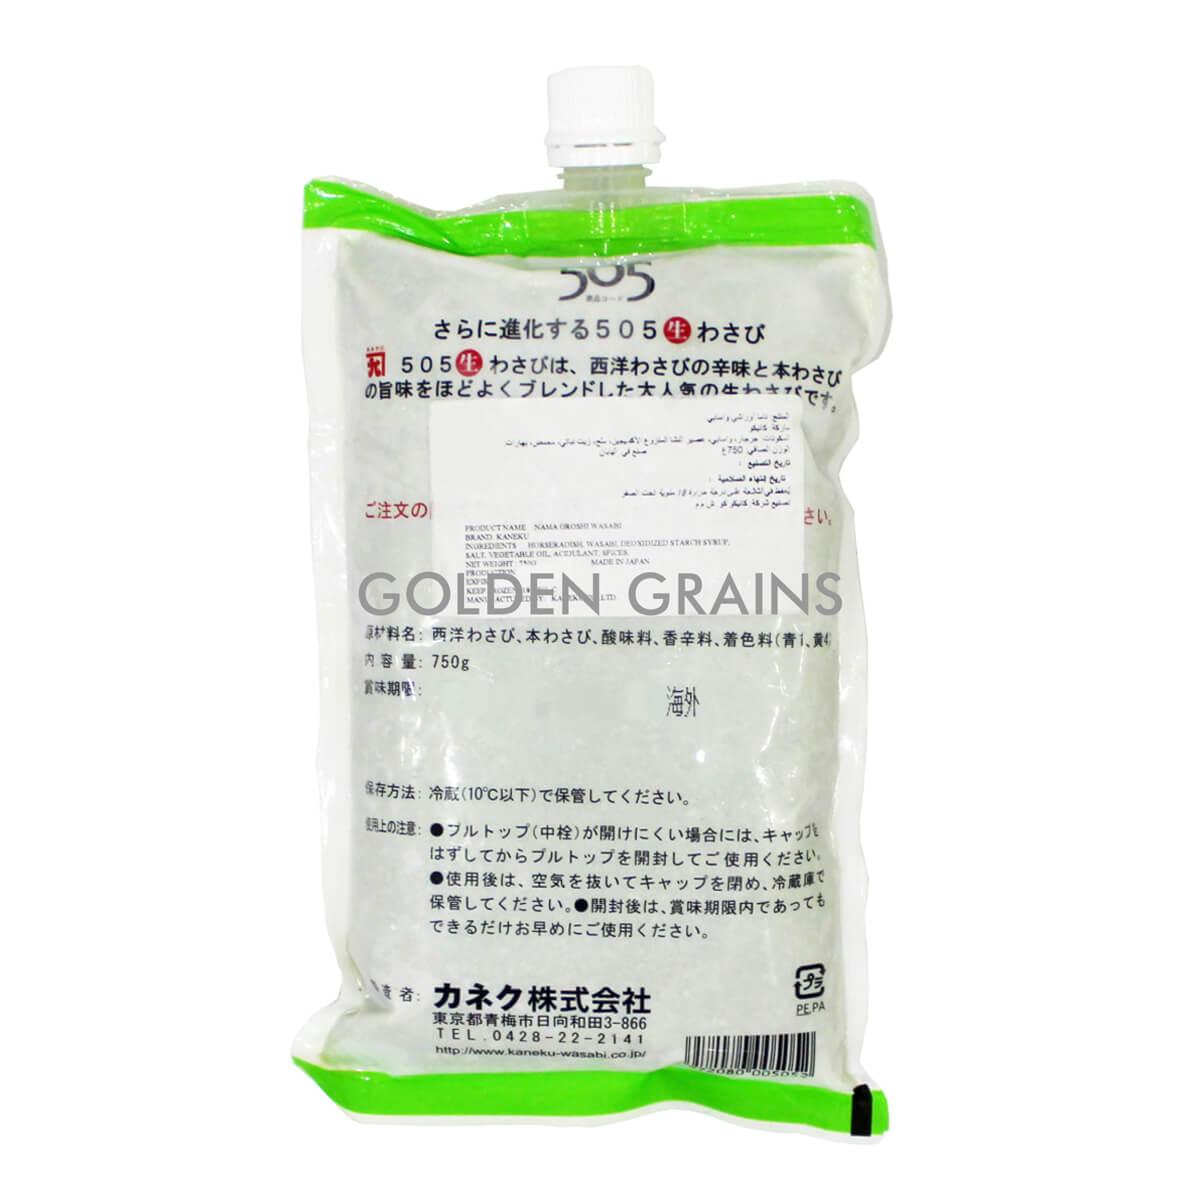 Golden Grains Kaneku - Nama Wasabi - Back.jpg